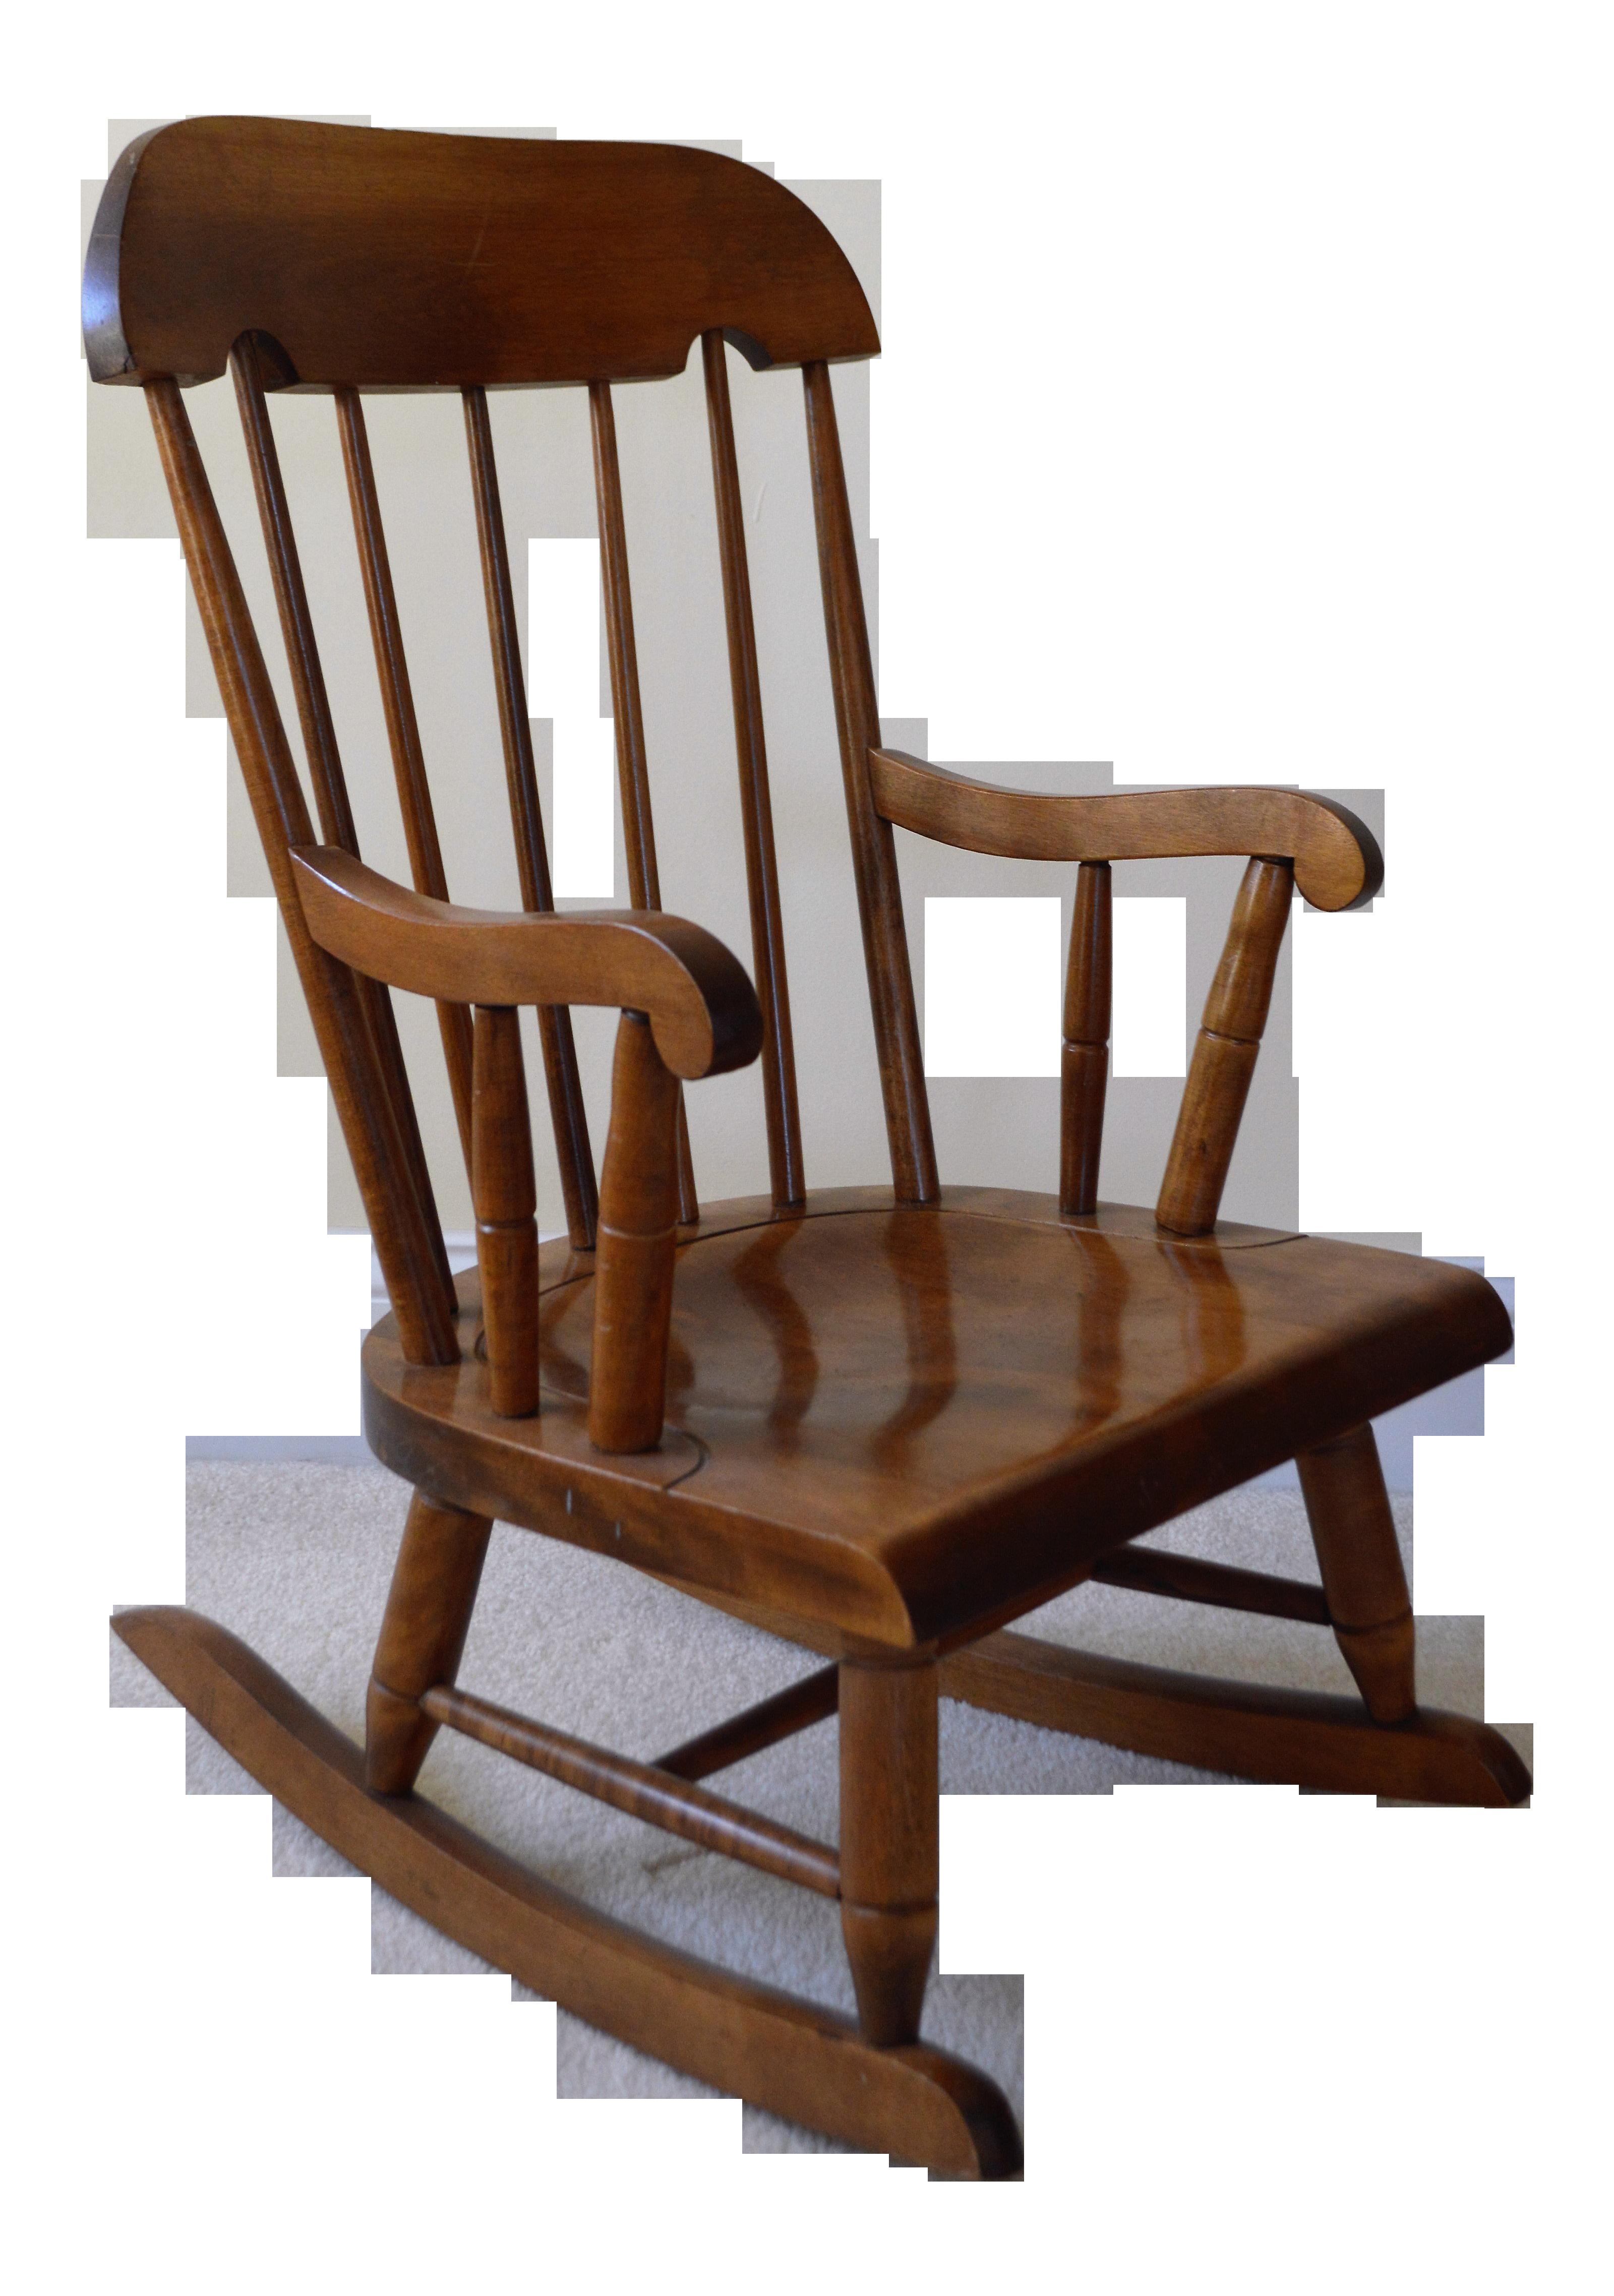 Fine 1970S Vintage Nichols Stones Child Size Rocking Chair Creativecarmelina Interior Chair Design Creativecarmelinacom